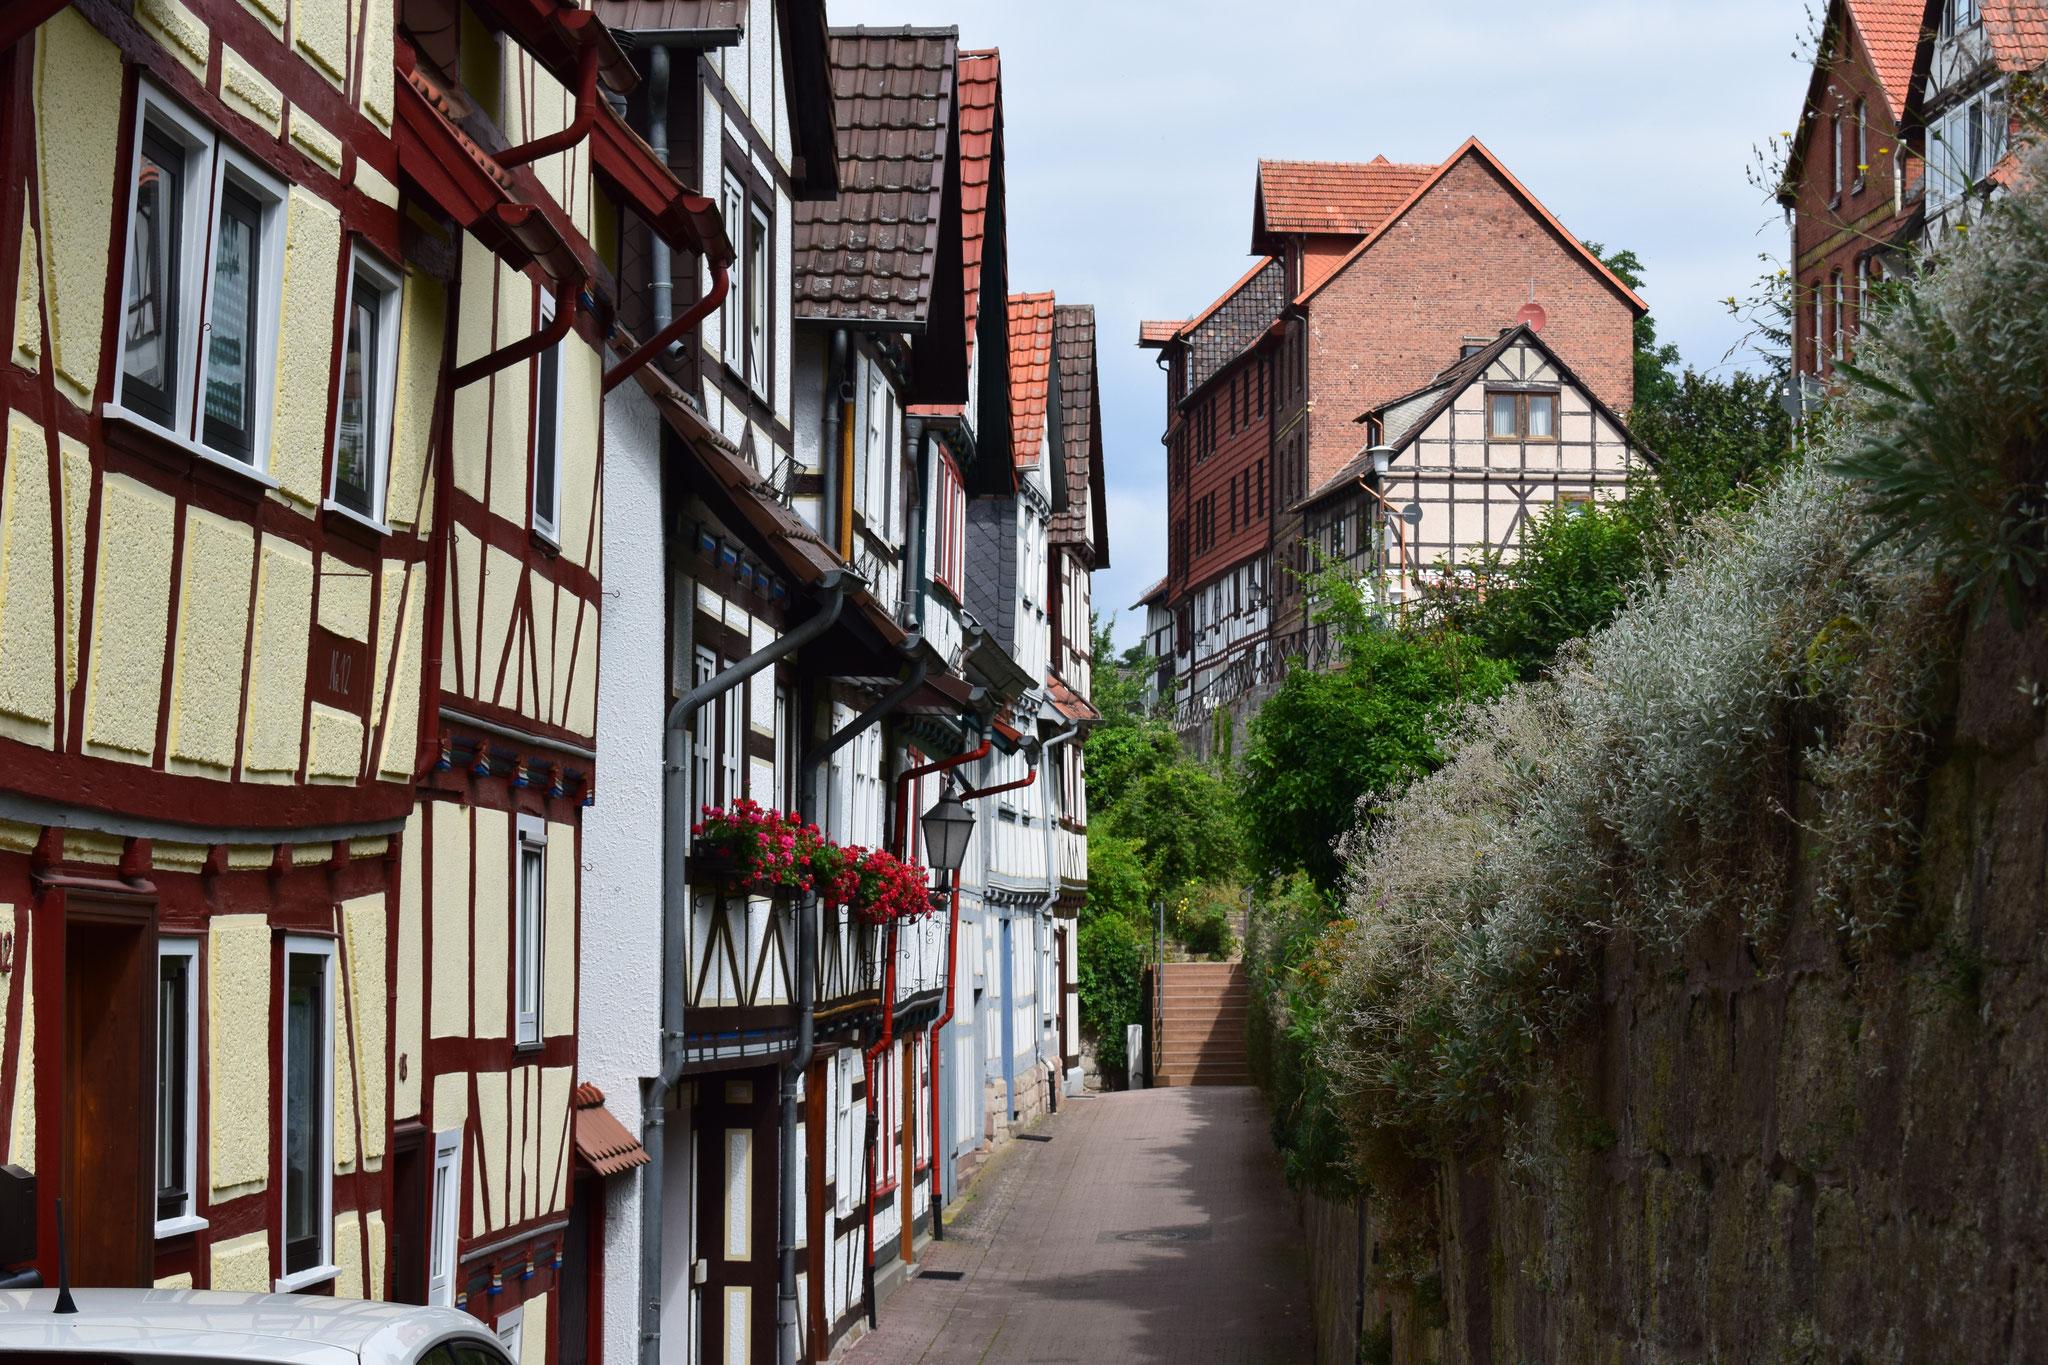 Bad Sooden-Allendorf